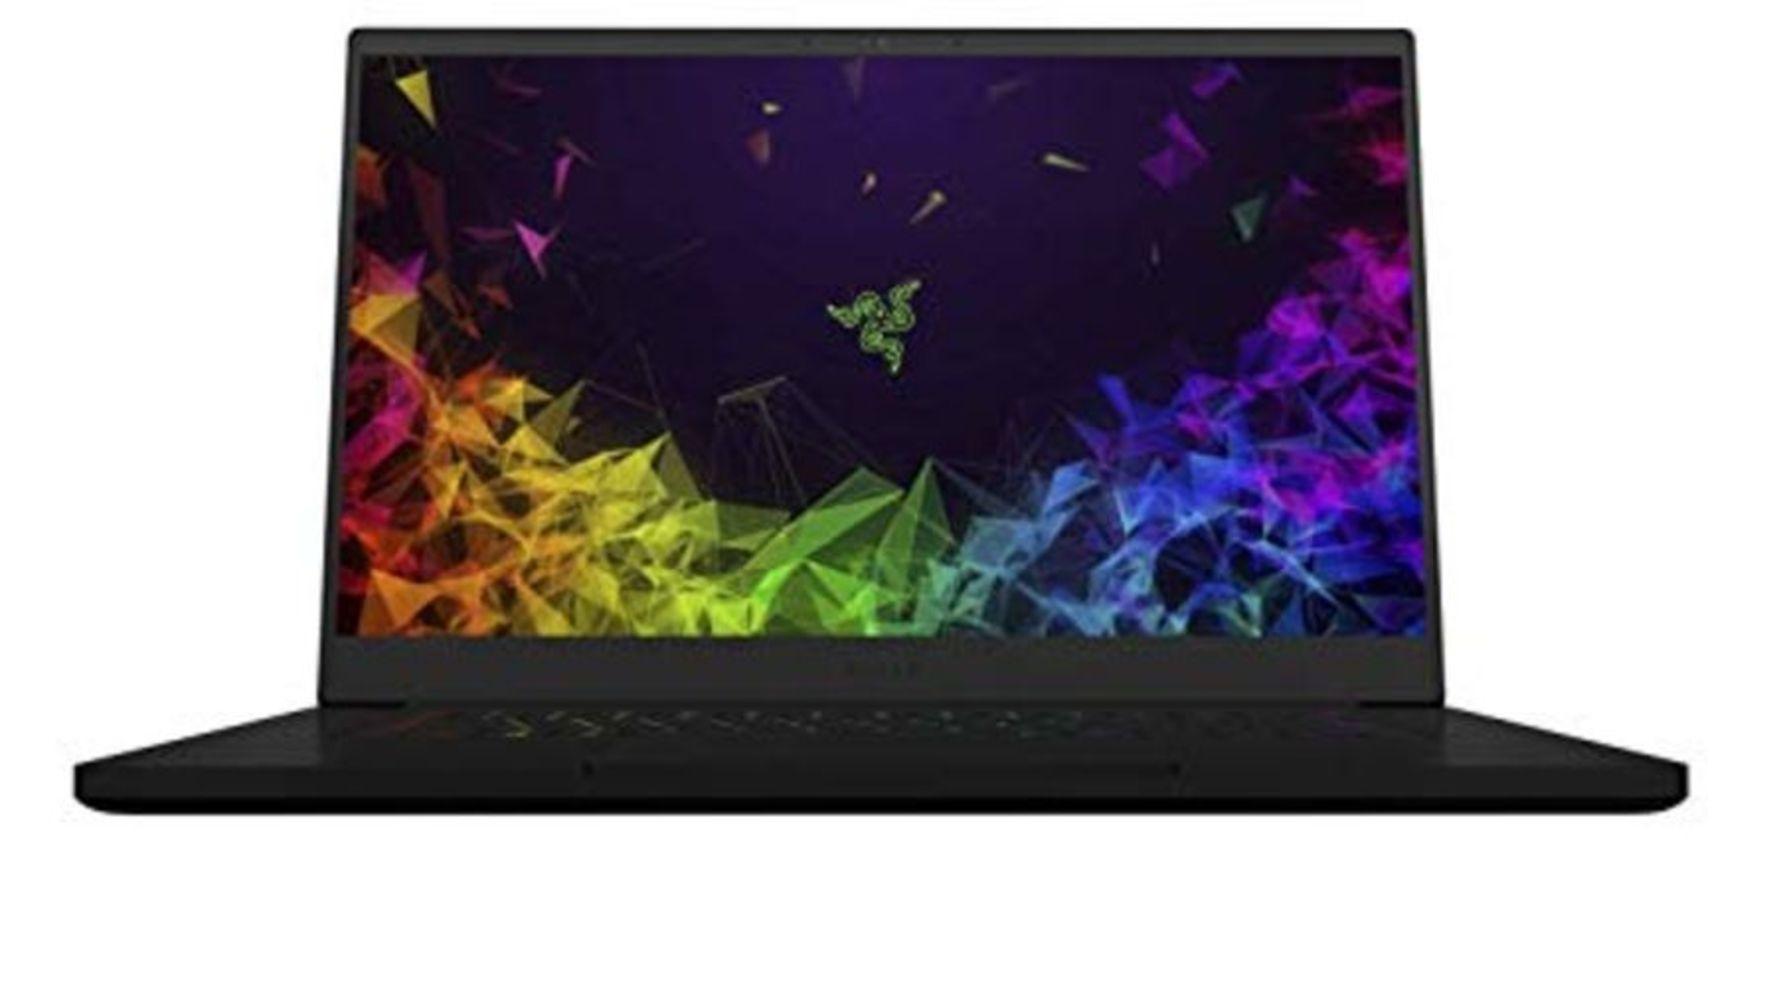 Wireless Products | Razer Blade, Sony, Apple, Sony, Fujitsu, Samsung, Philips | Laptops, Mobile Phone, Printers, Tablets,